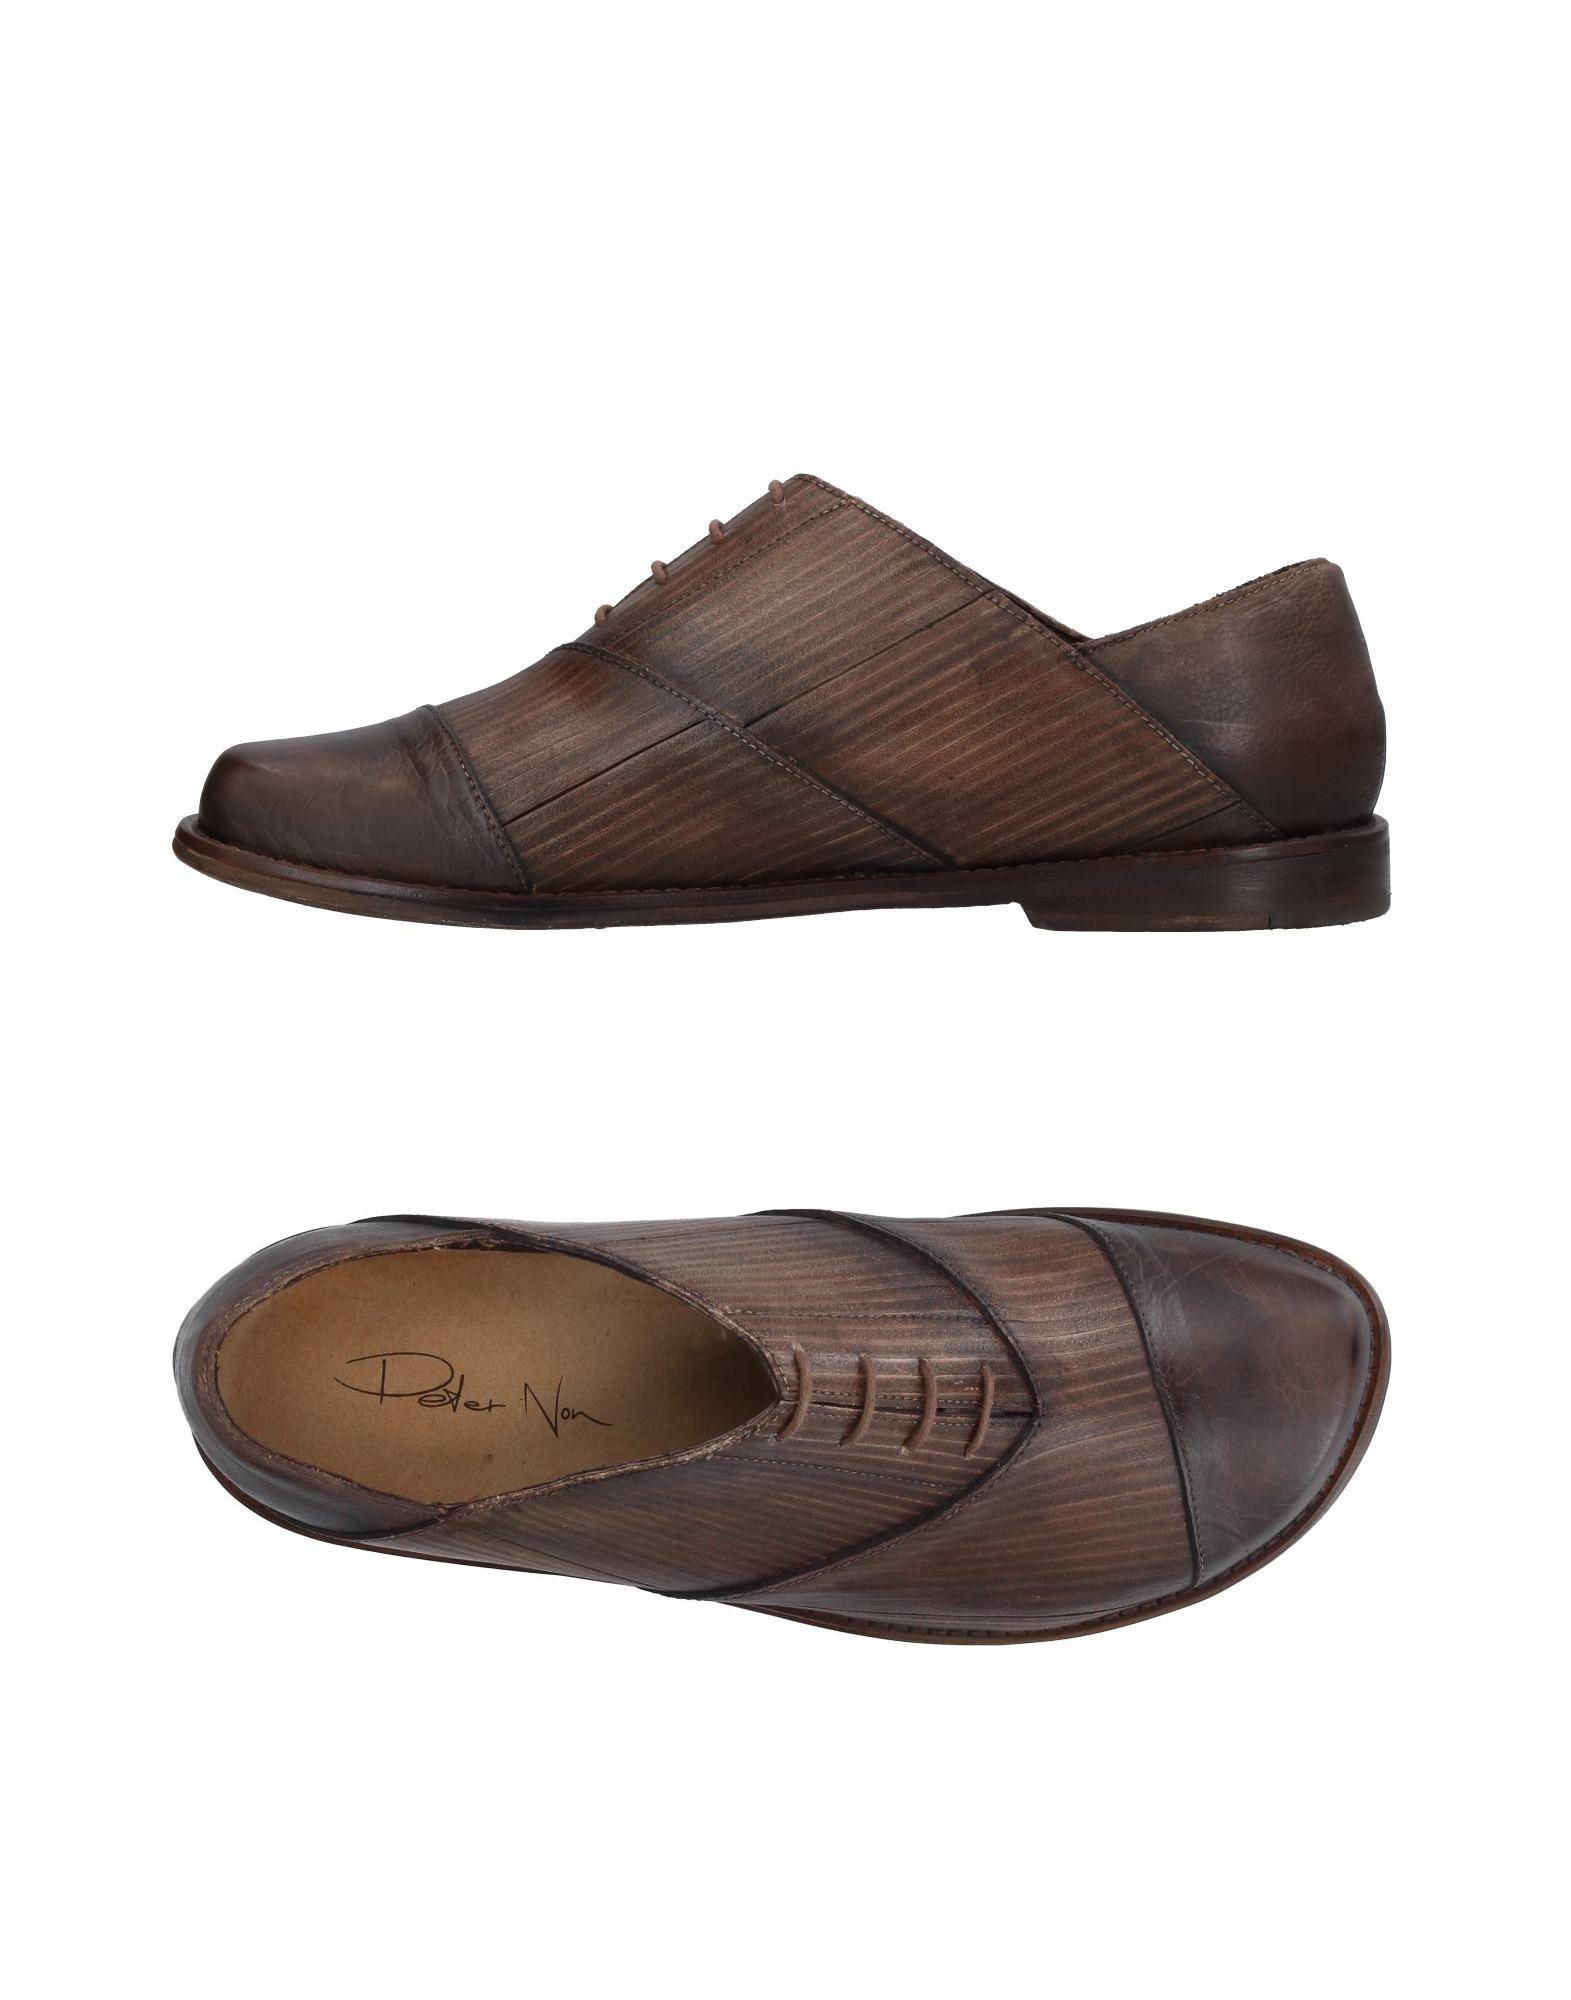 Peter Non Schnürschuhe Qualität Herren  11373122QP Gute Qualität Schnürschuhe beliebte Schuhe fc8189